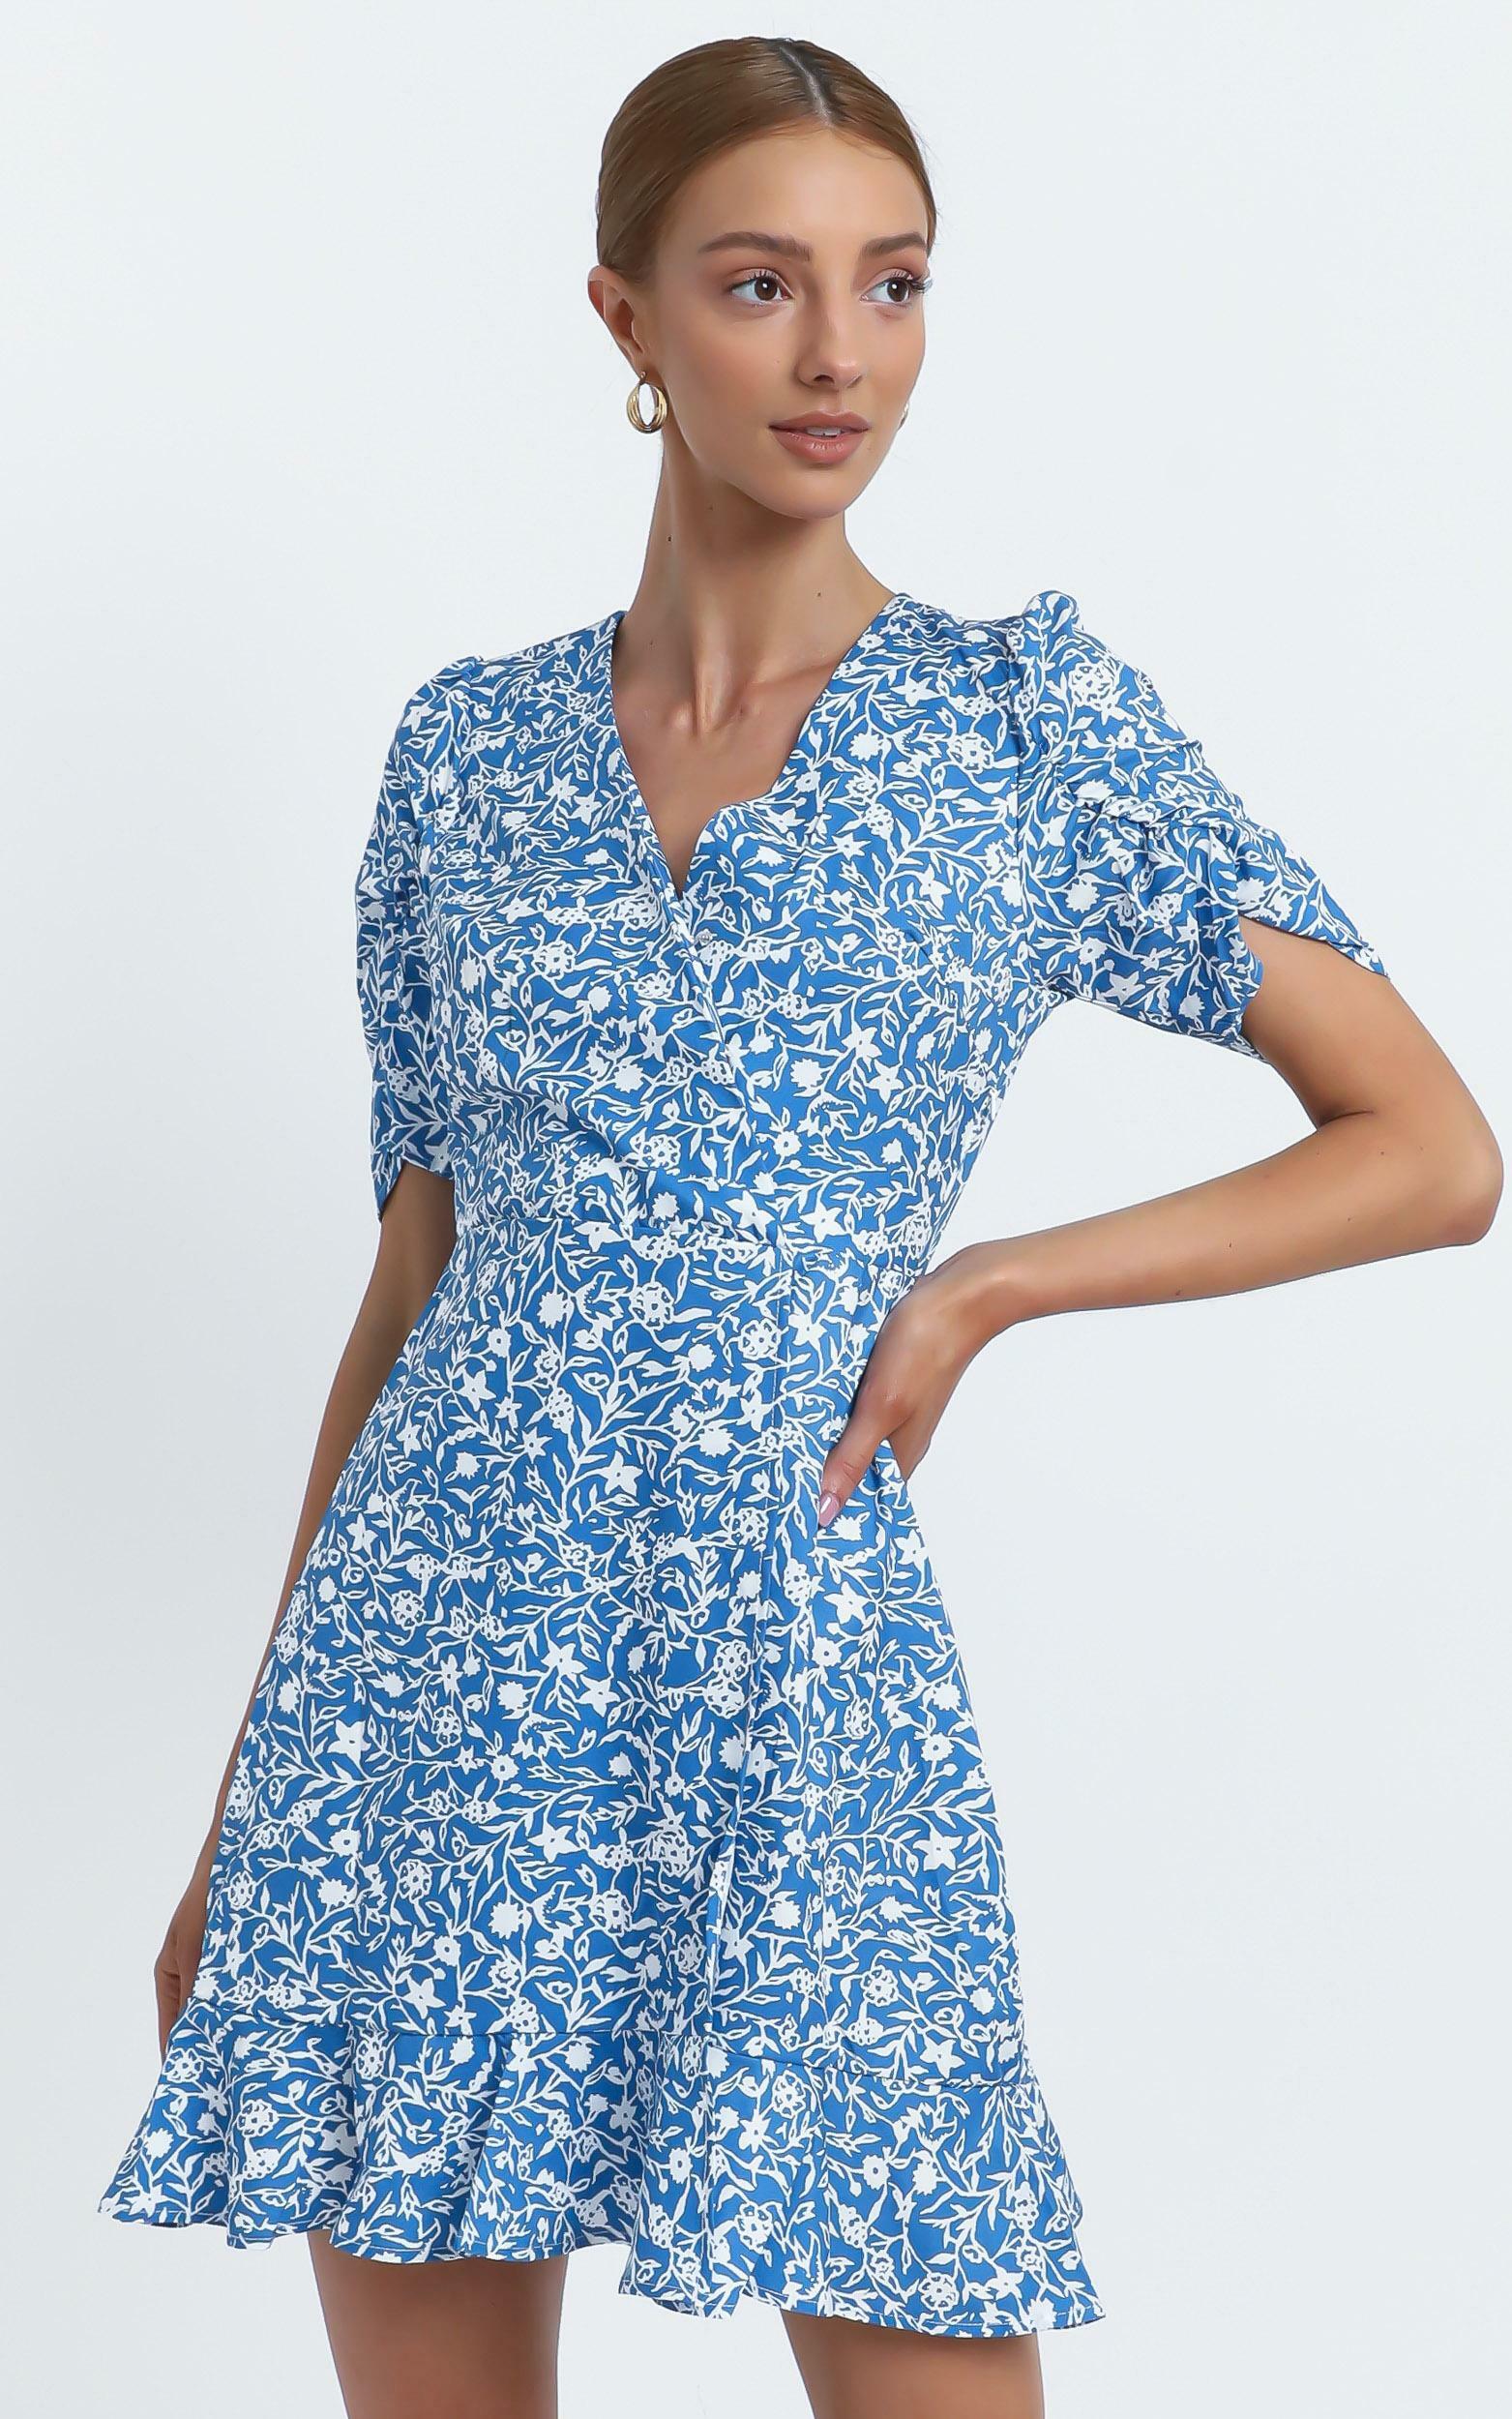 Sapphira Dress in Blue Floral - 12 (L), Blue, hi-res image number null